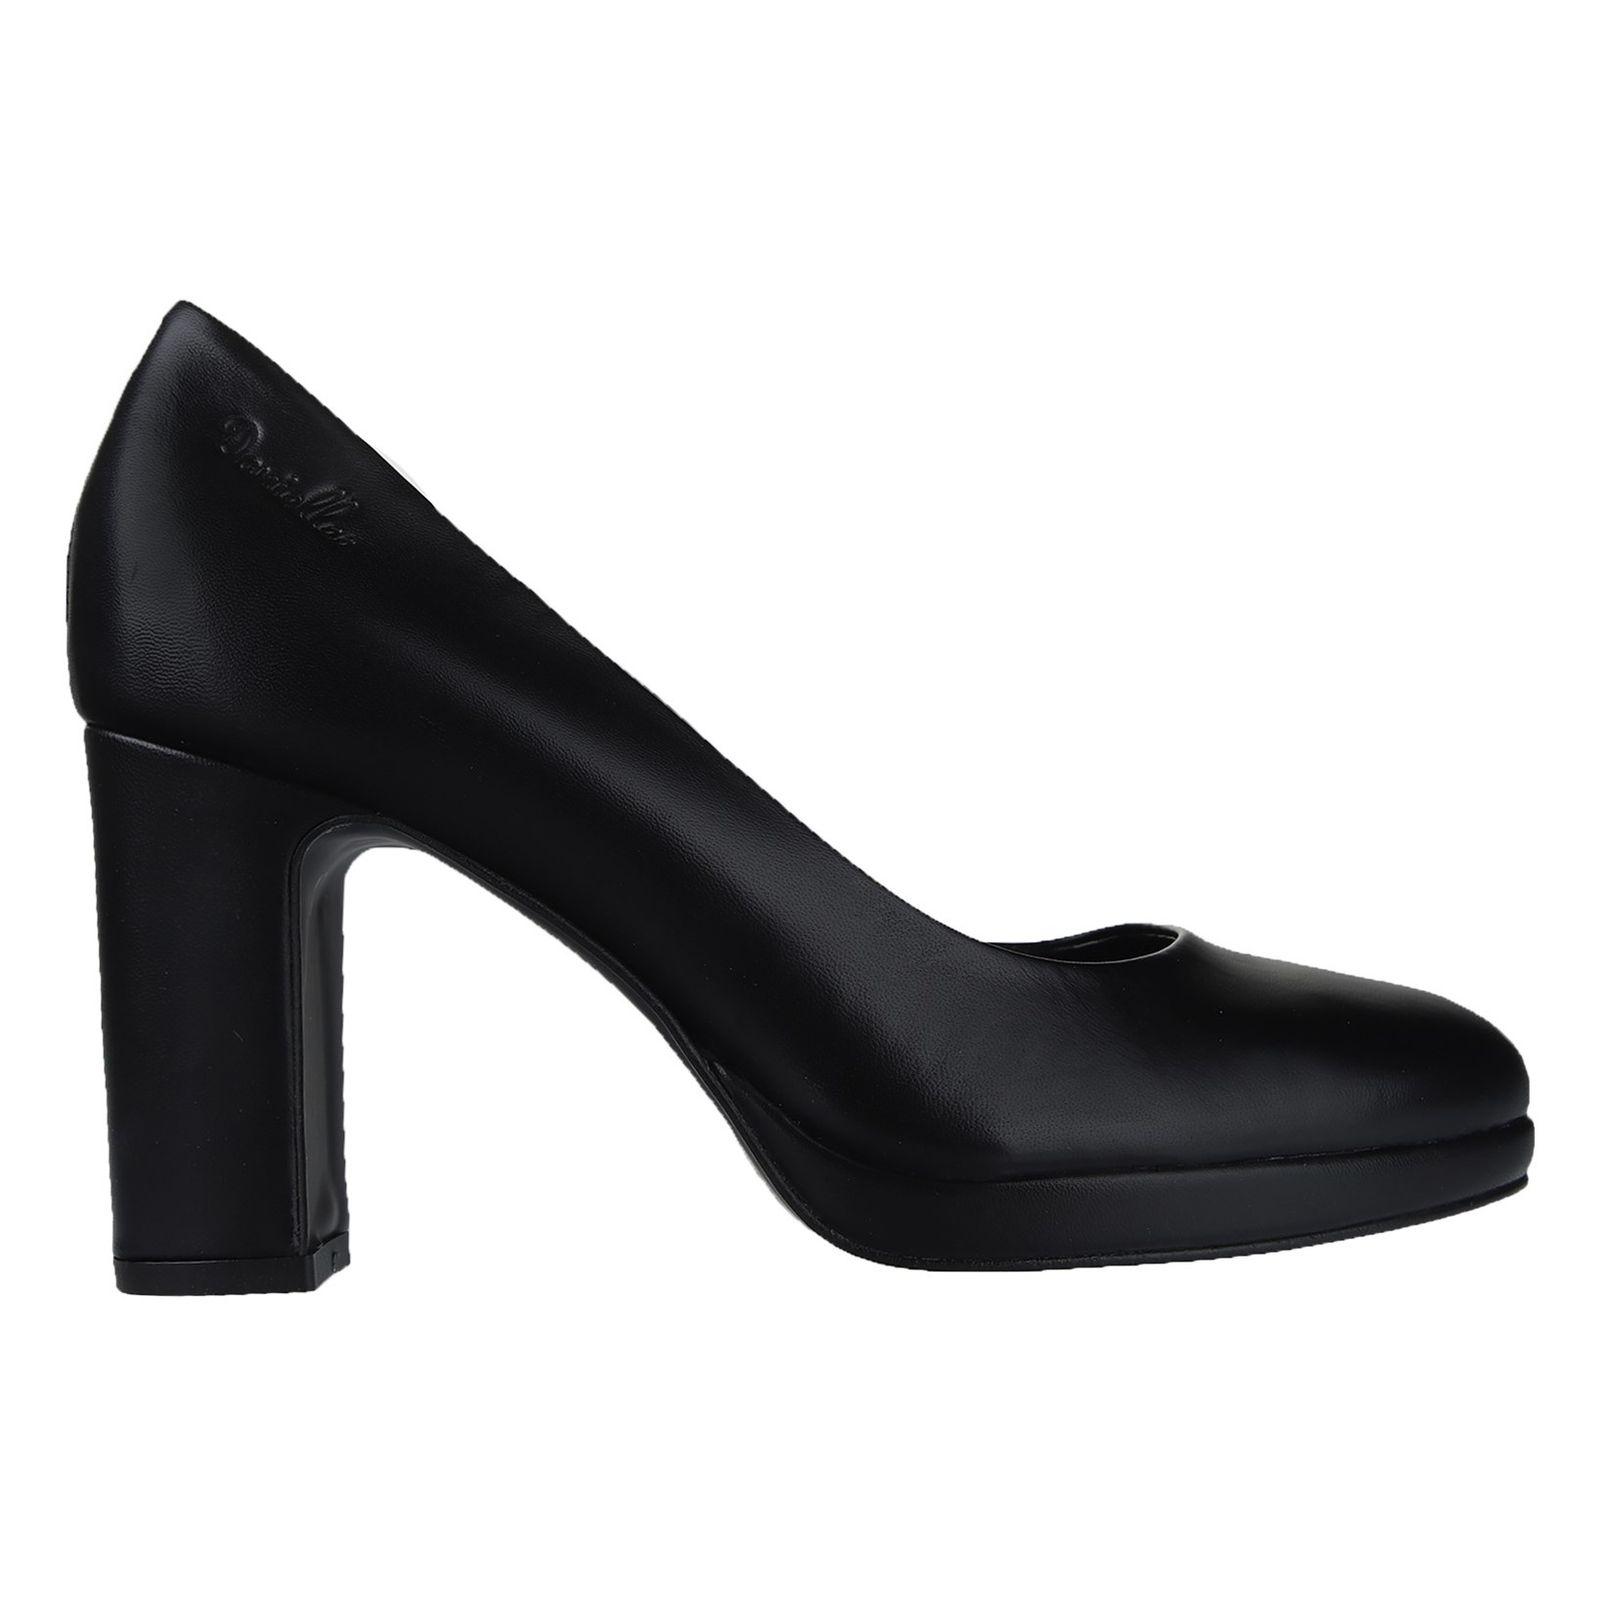 کفش چرم پاشنه بلند زنانه Julliet - دنیلی - مشکي - 1